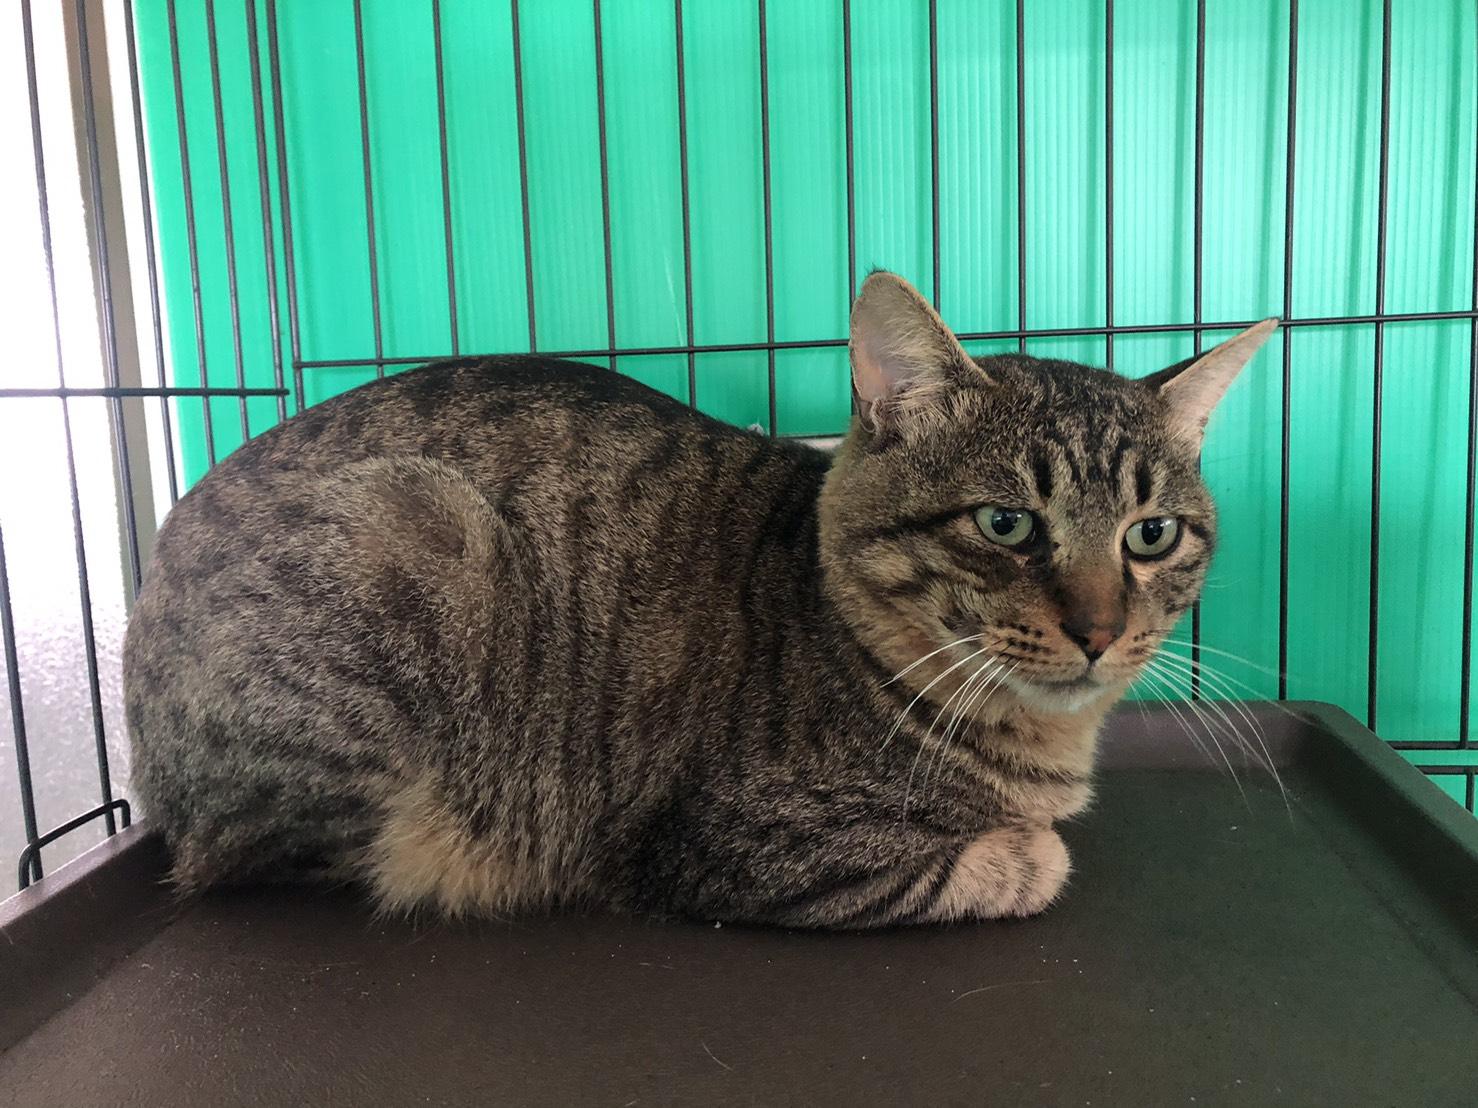 <ul> <li>猫種:日本猫 キジトラ</li> <li>性別:男の子</li> <li>名前:ニコ</li> <li>年齢:2017年7月17日</li> <li>保護経緯:飼い主様が高齢で、引越しするため飼育困難になり引き取りました</li> </ul>